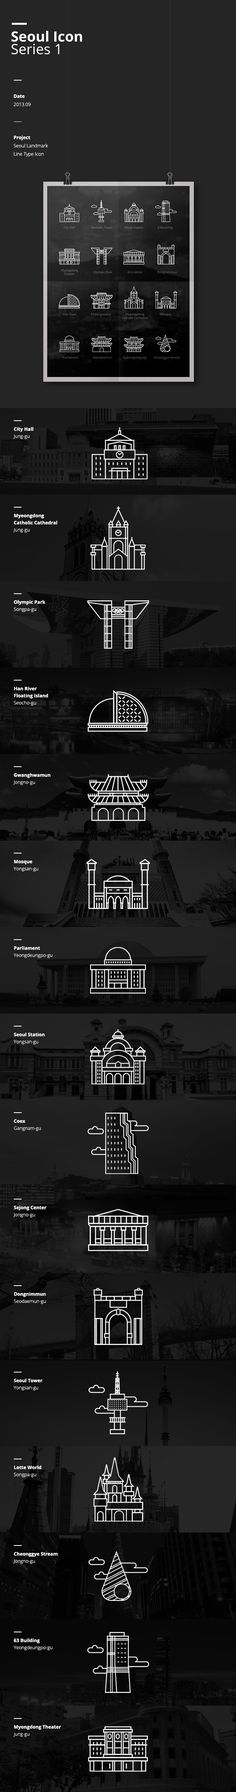 Seoul Landmark Icon Series 1